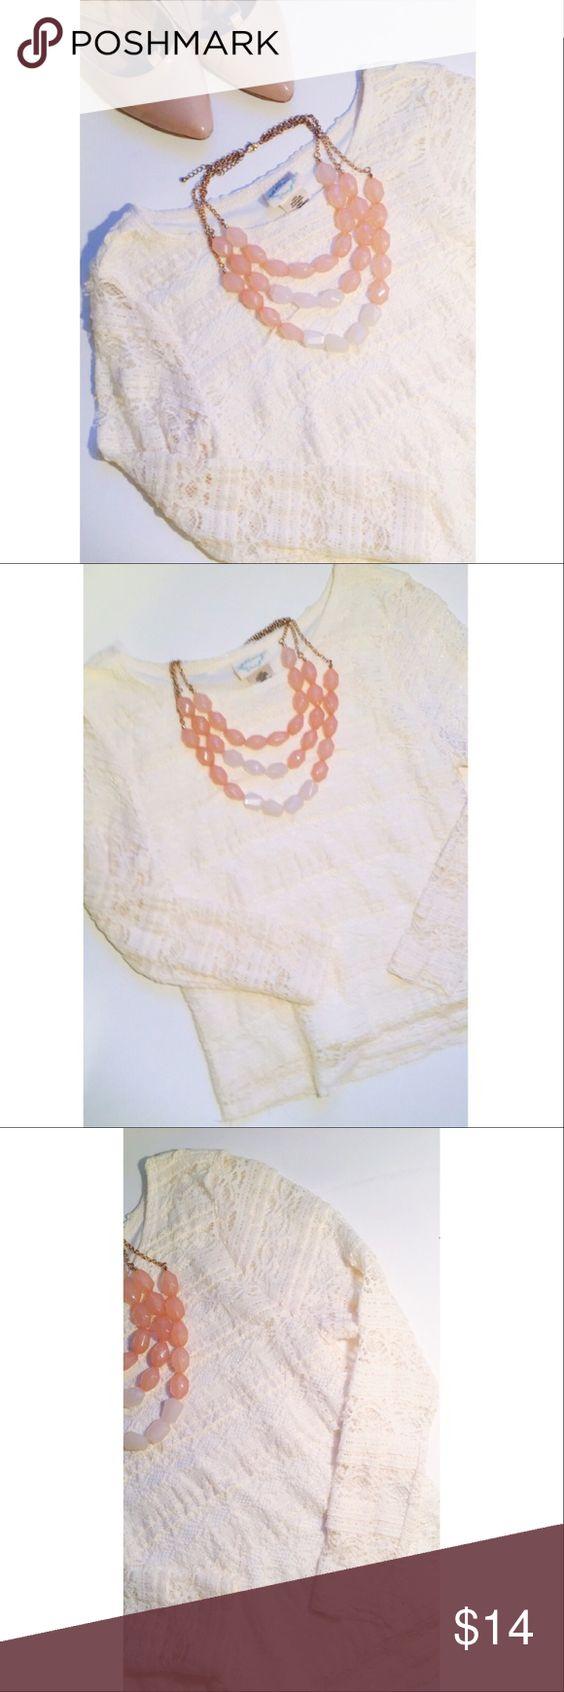 Lace Crop Top🎀 Long sleeve lace crop top! Belle Du Jour Tops Crop Tops